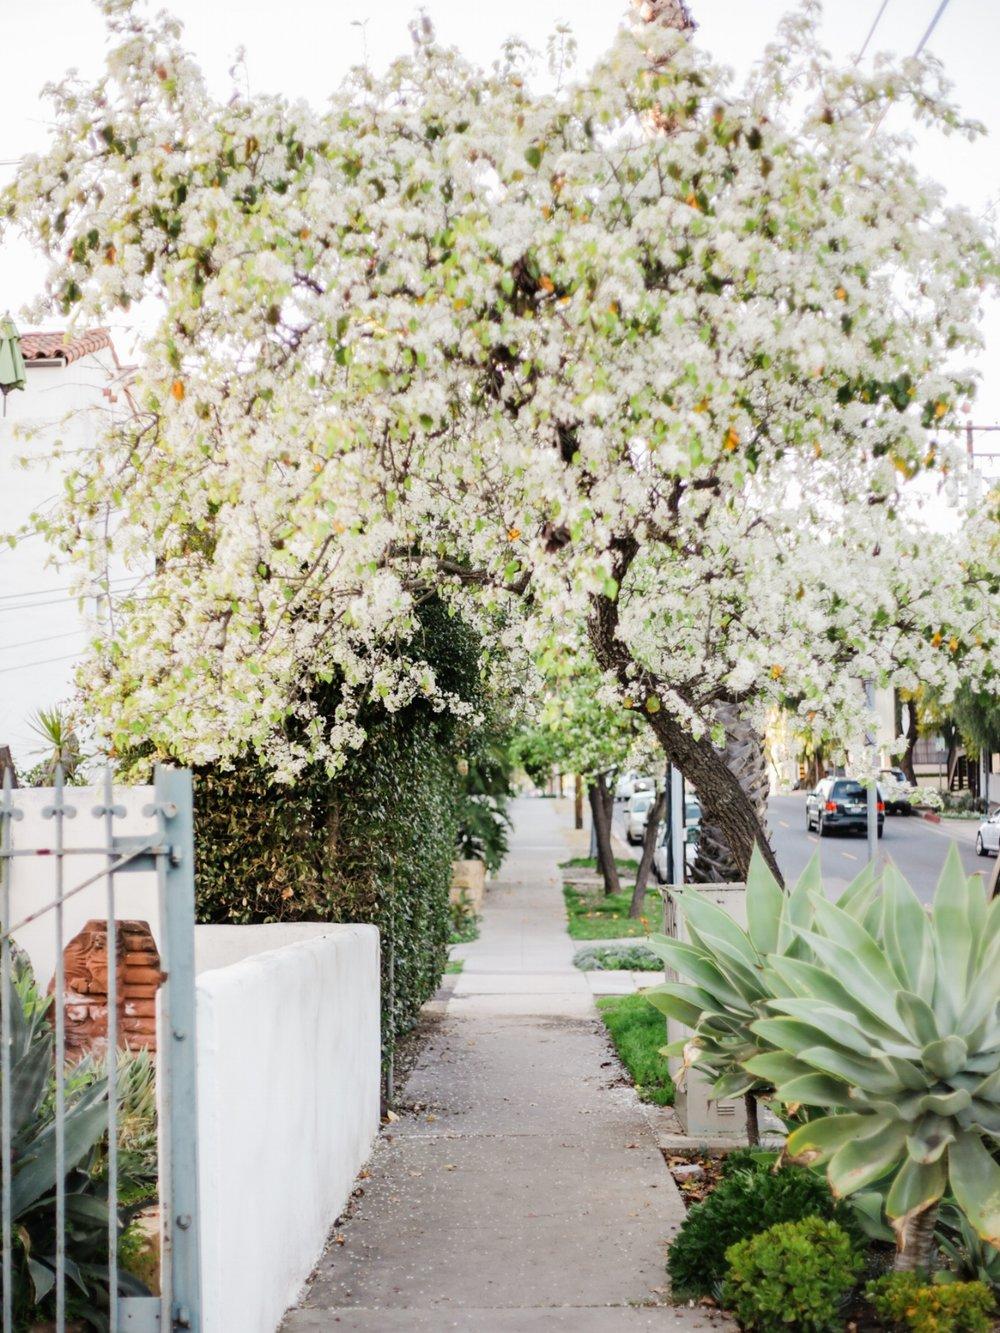 Santa-Barbara-Panino-Architect Corner-5.jpg